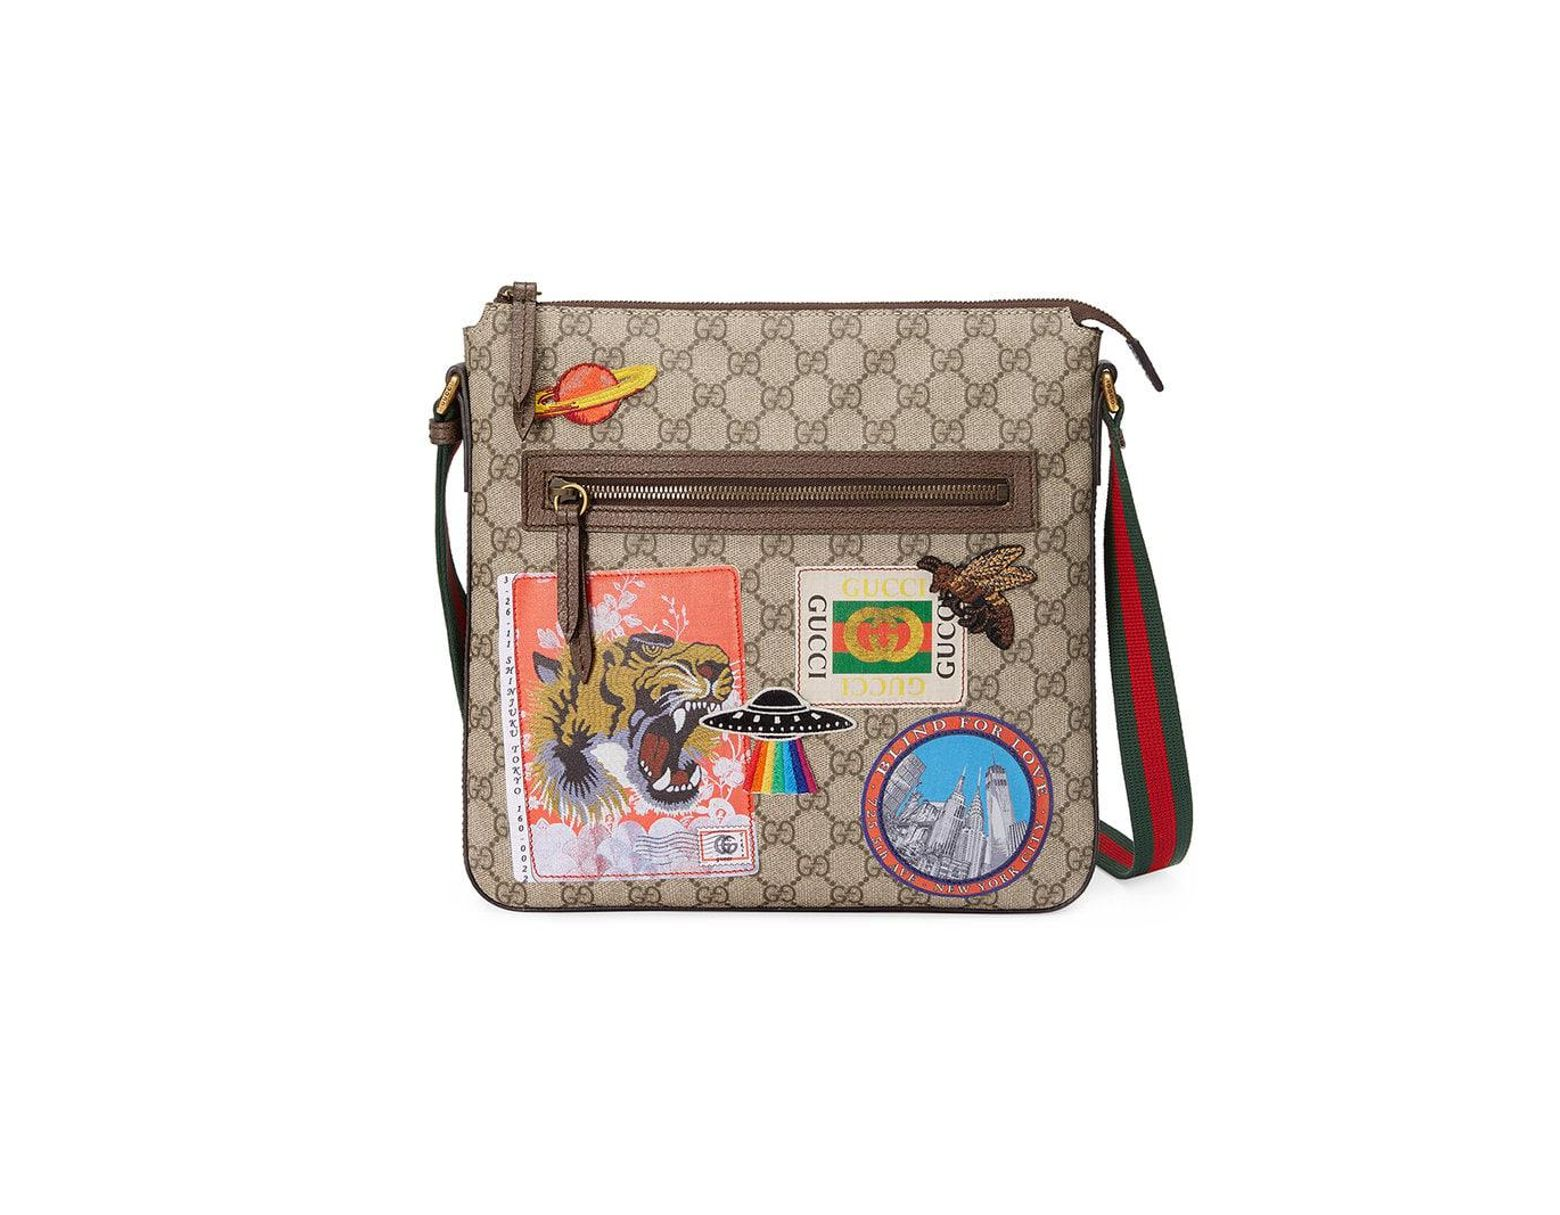 084df9540a5e Gucci Courrier Soft GG Supreme Messenger for Men - Save 12% - Lyst